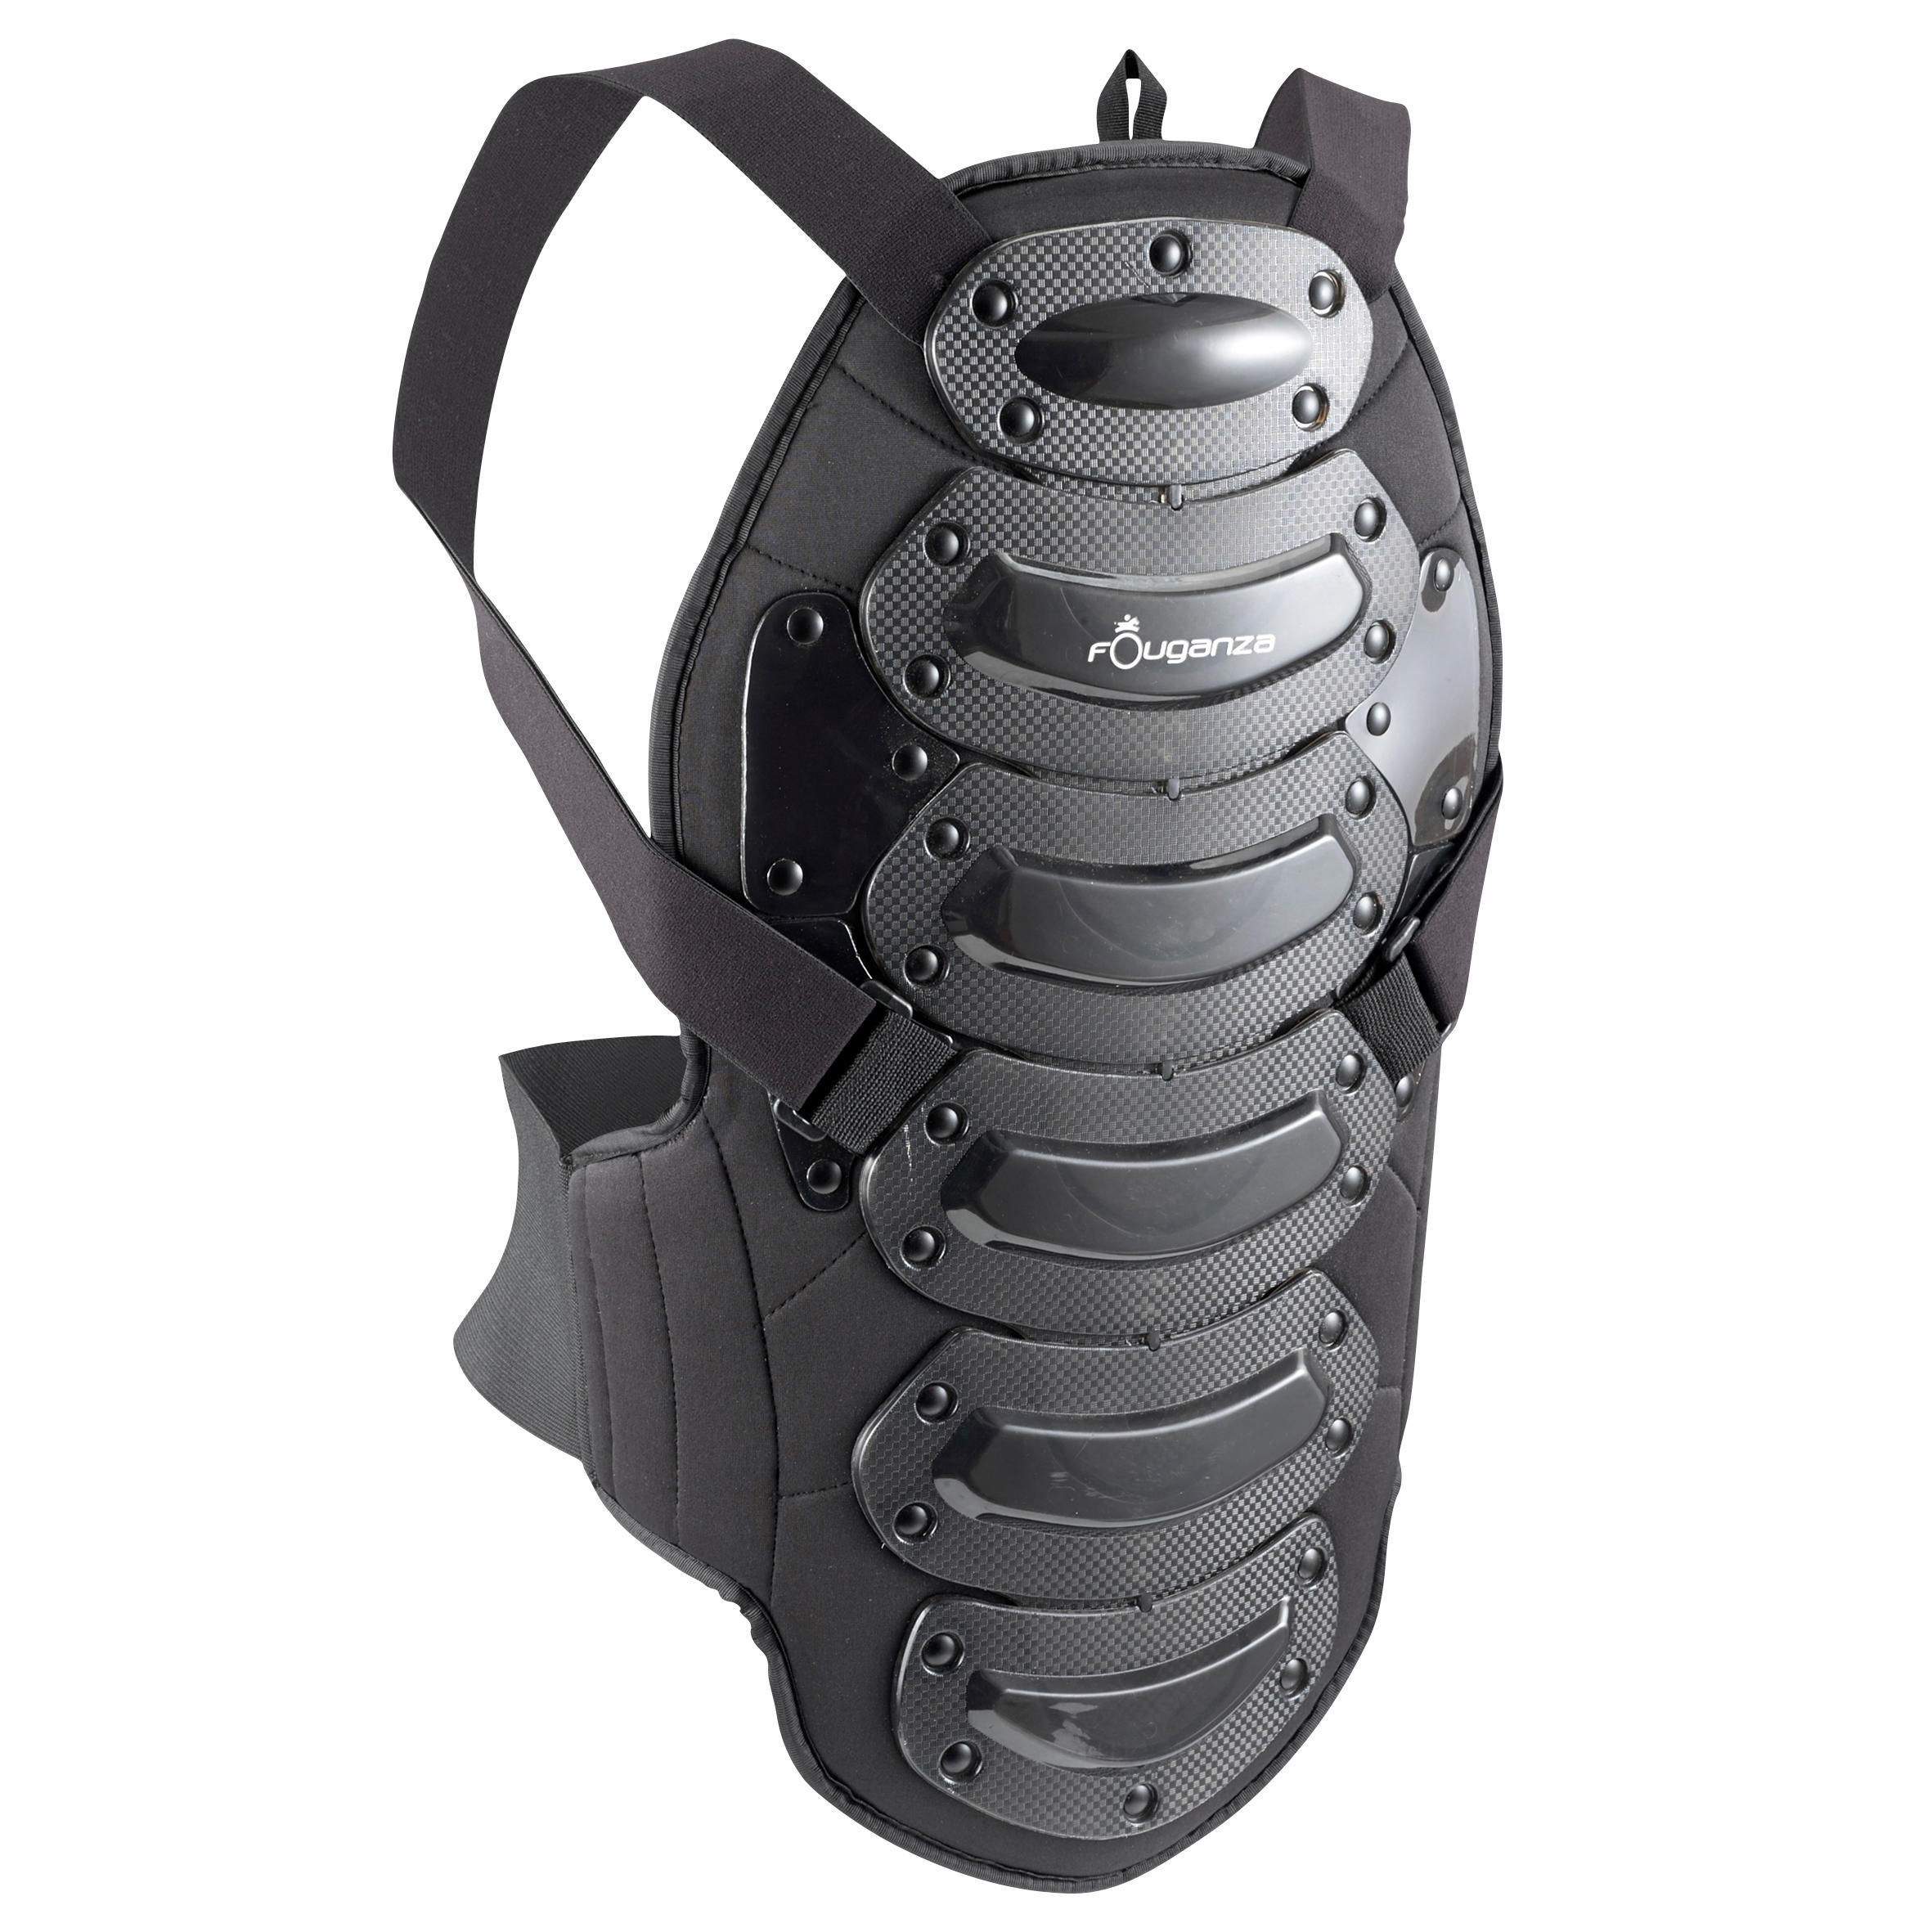 Fouganza Rugbeschermer Safety voor kinderen en volwassenen, ruitersport, zwart thumbnail